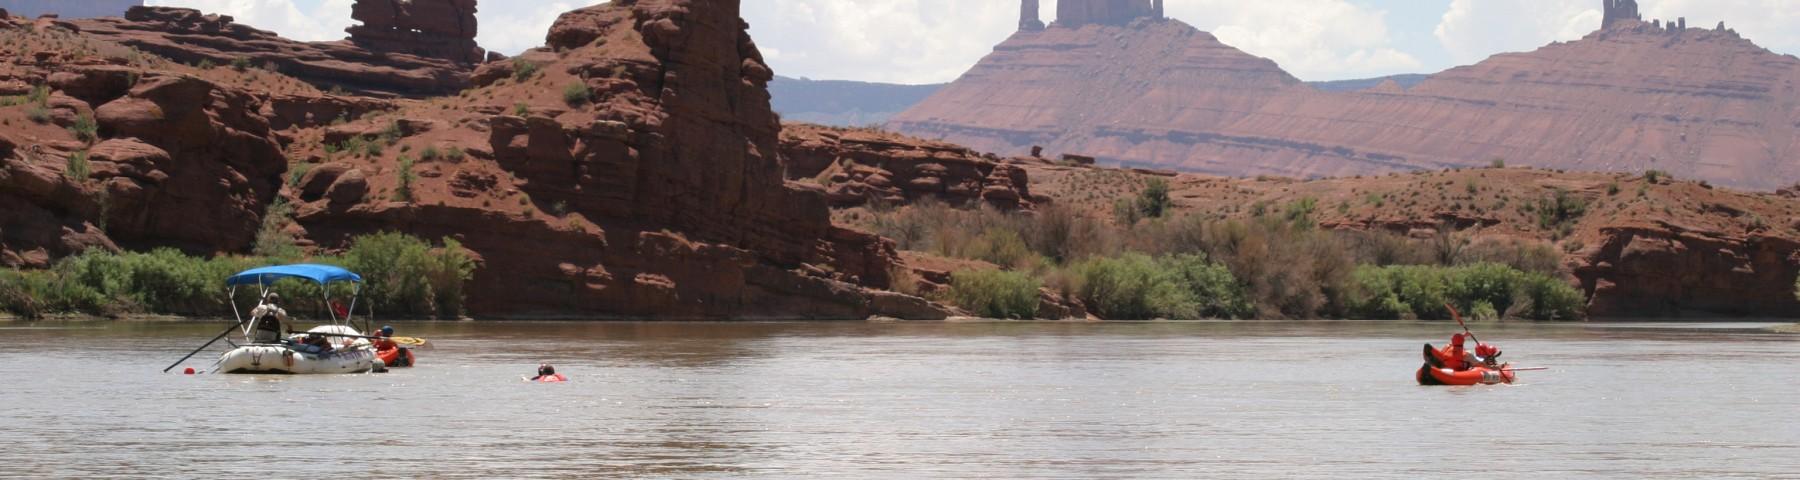 moab2